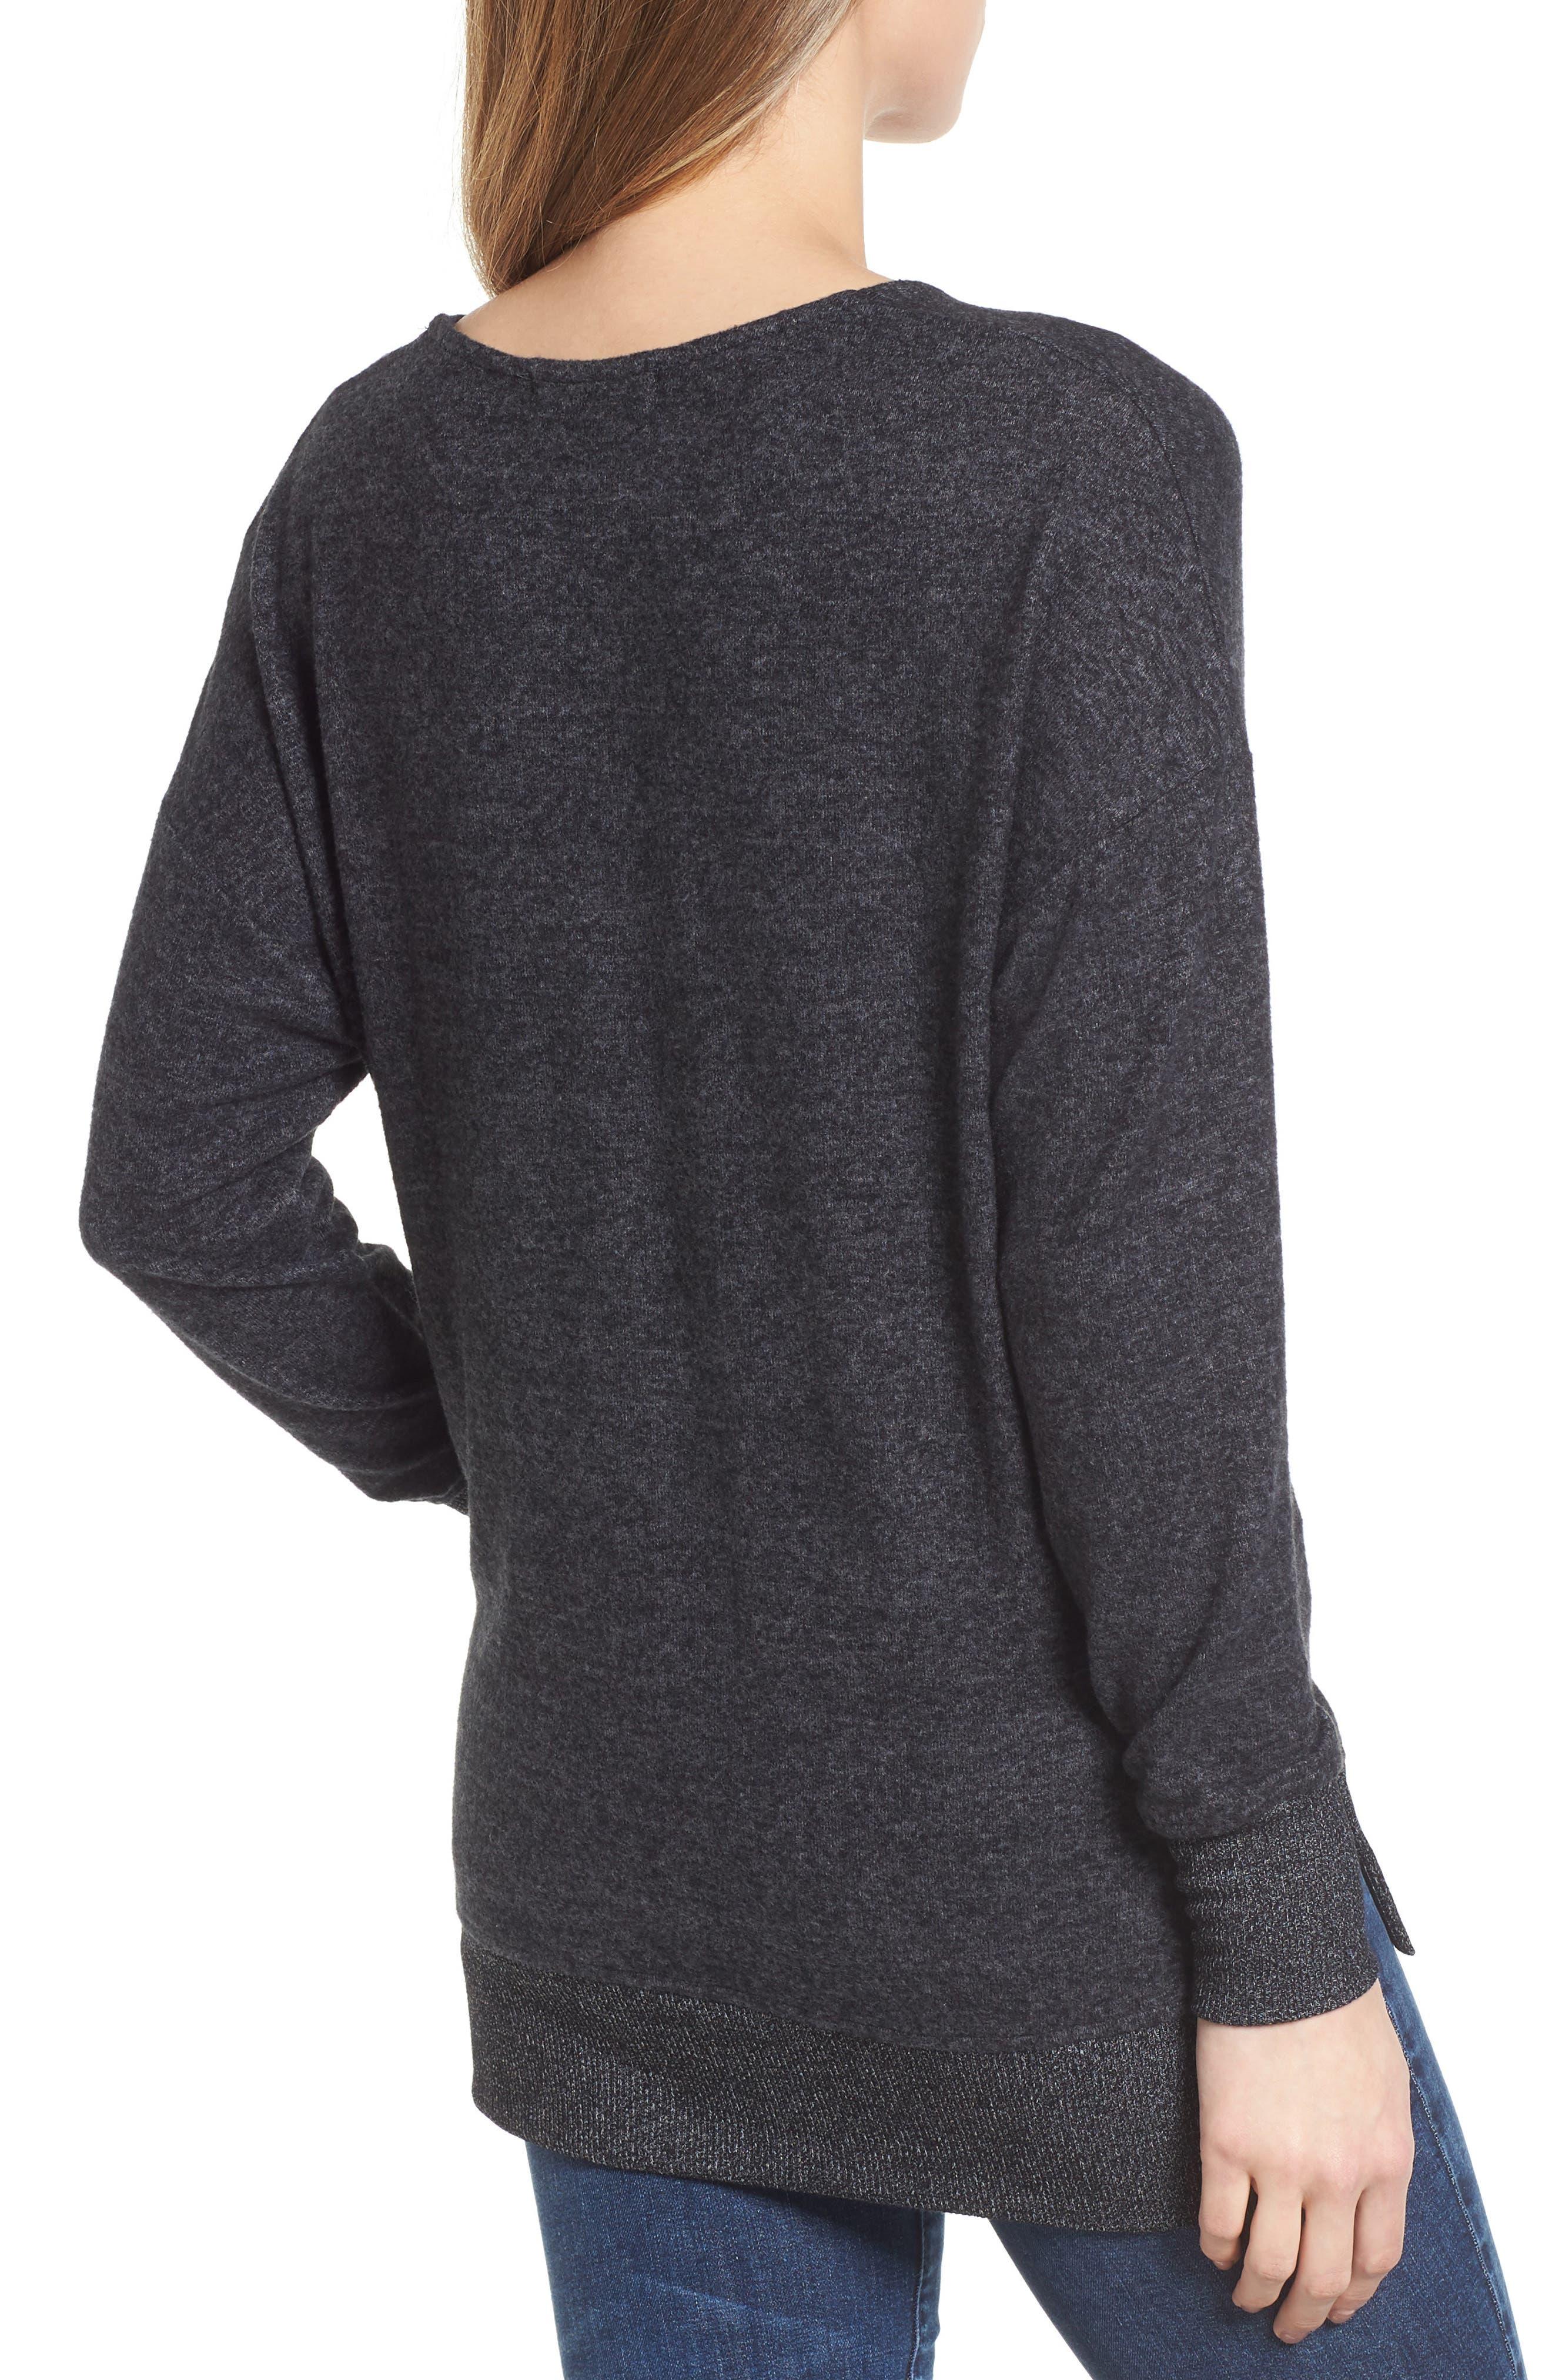 Cozy Sweatshirt,                             Alternate thumbnail 2, color,                             008